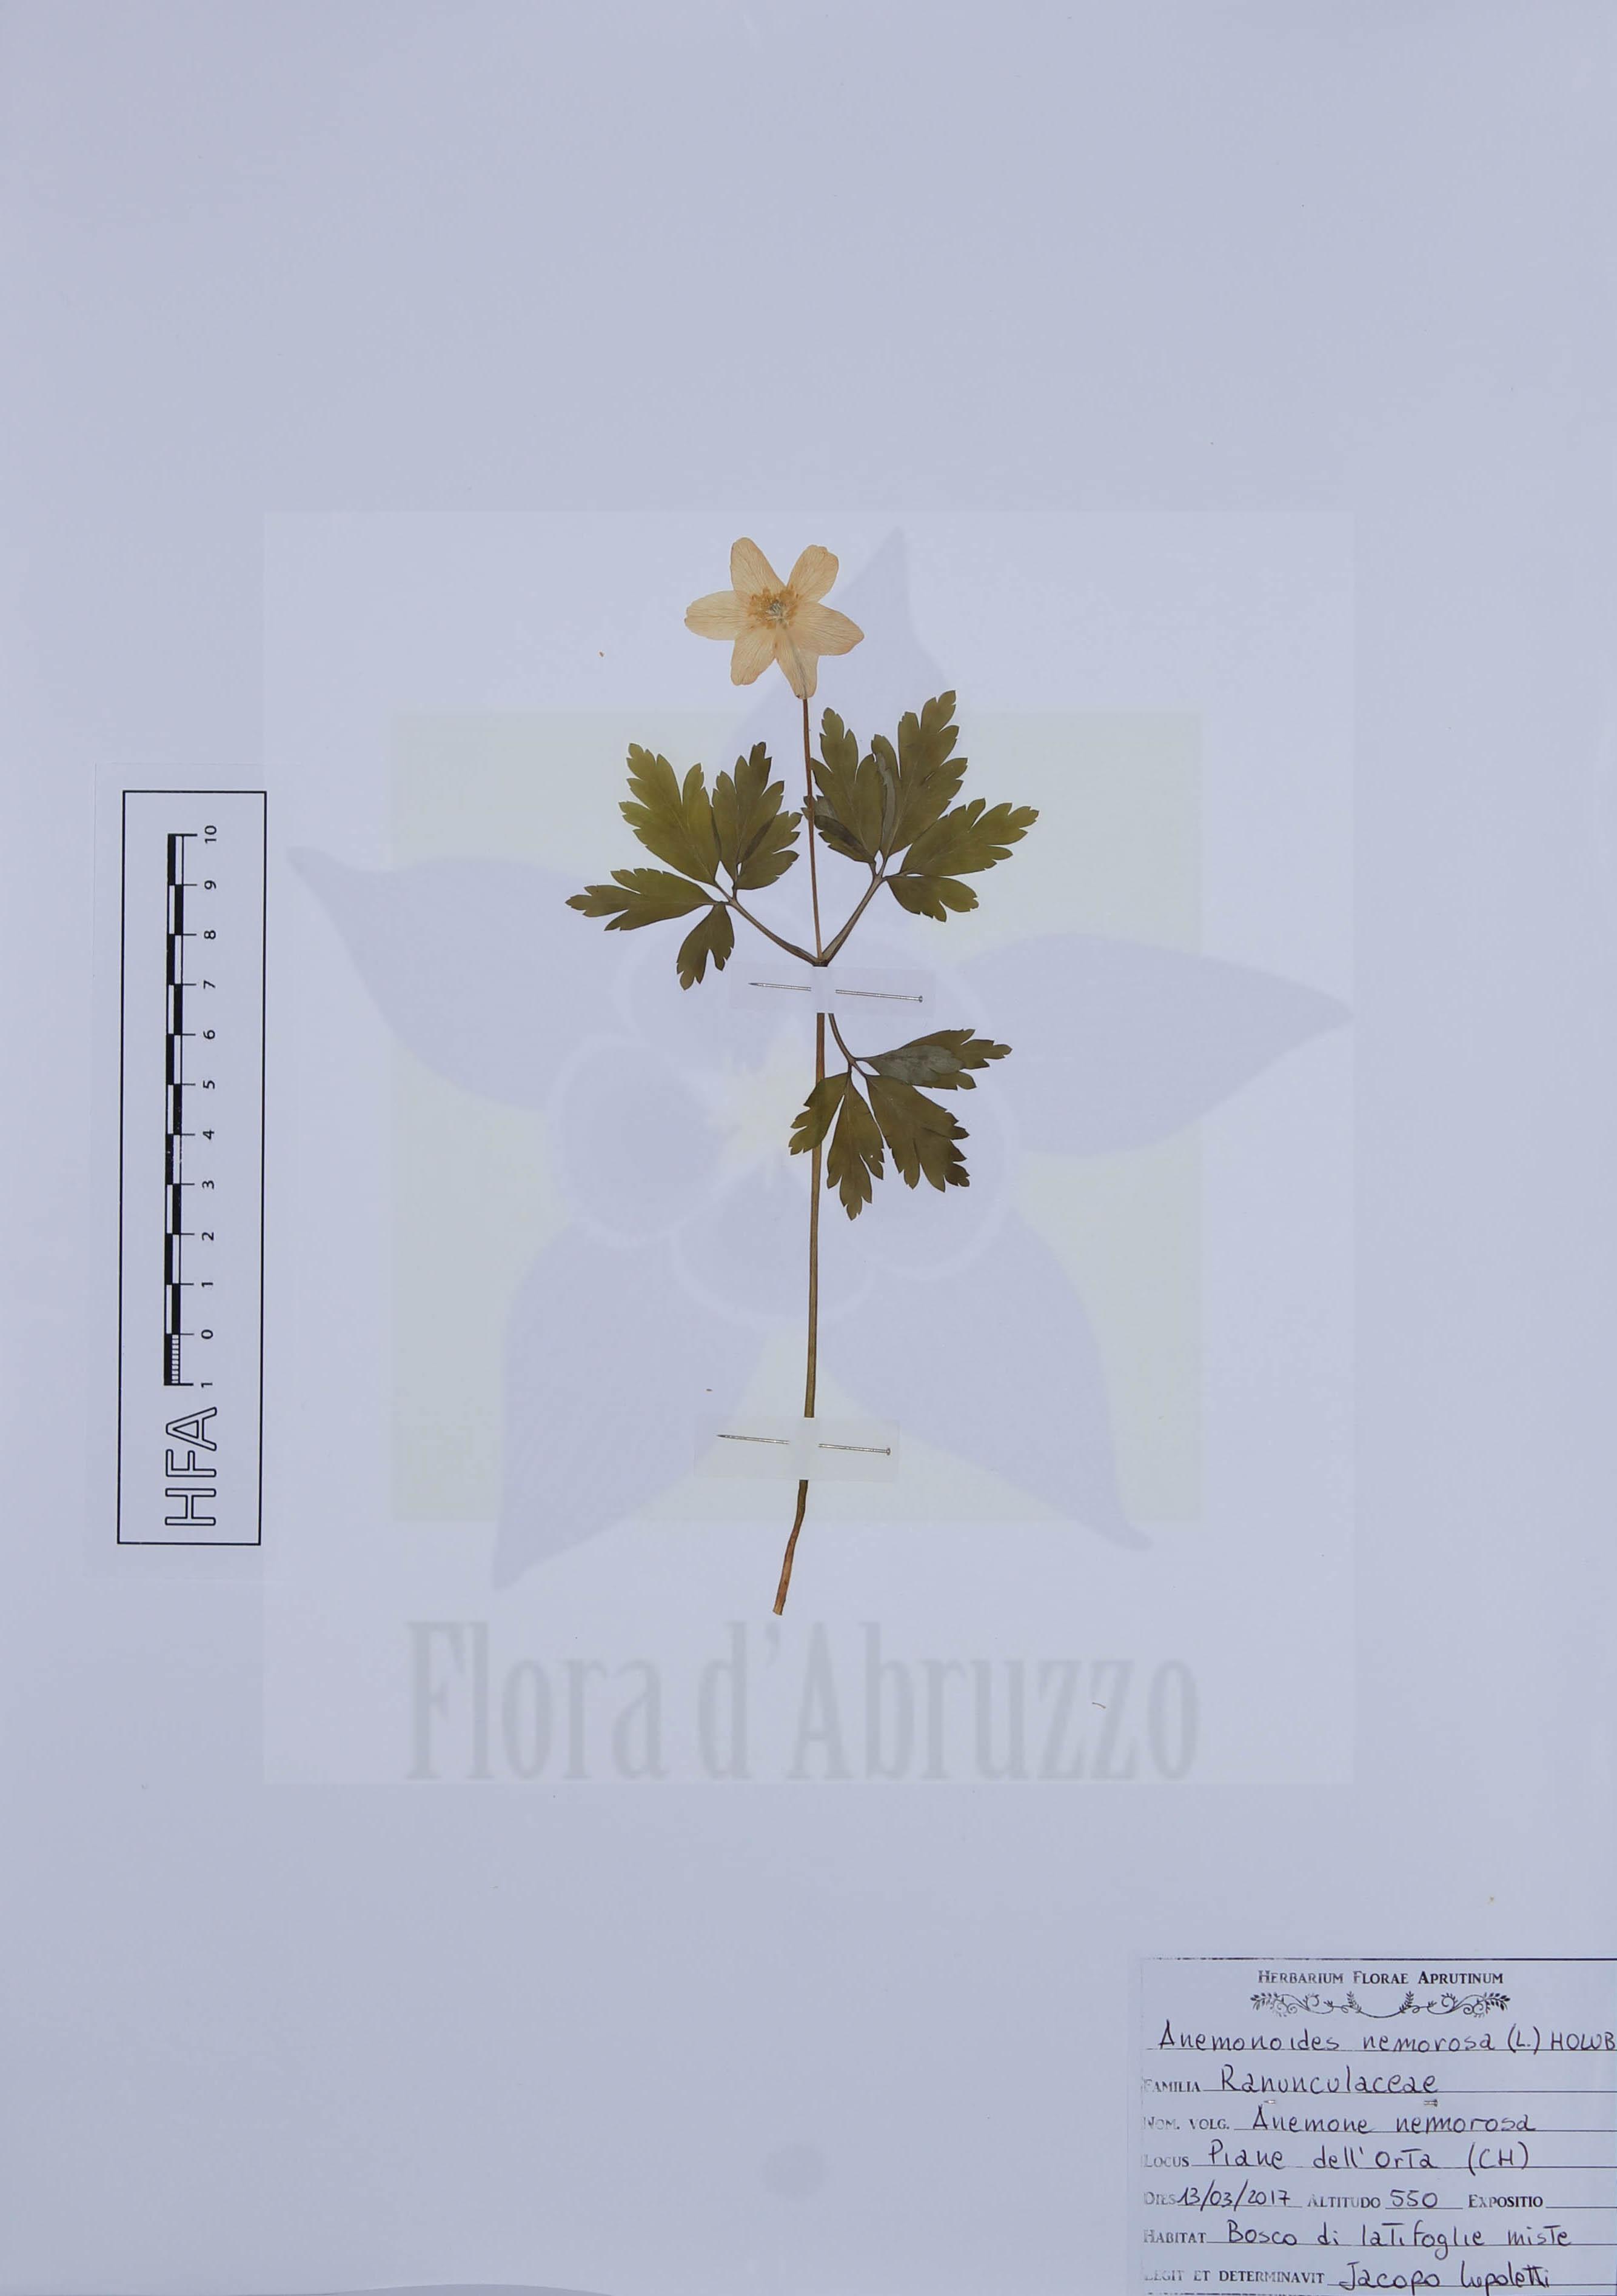 Anemonoides nemorosa(L.) Holub